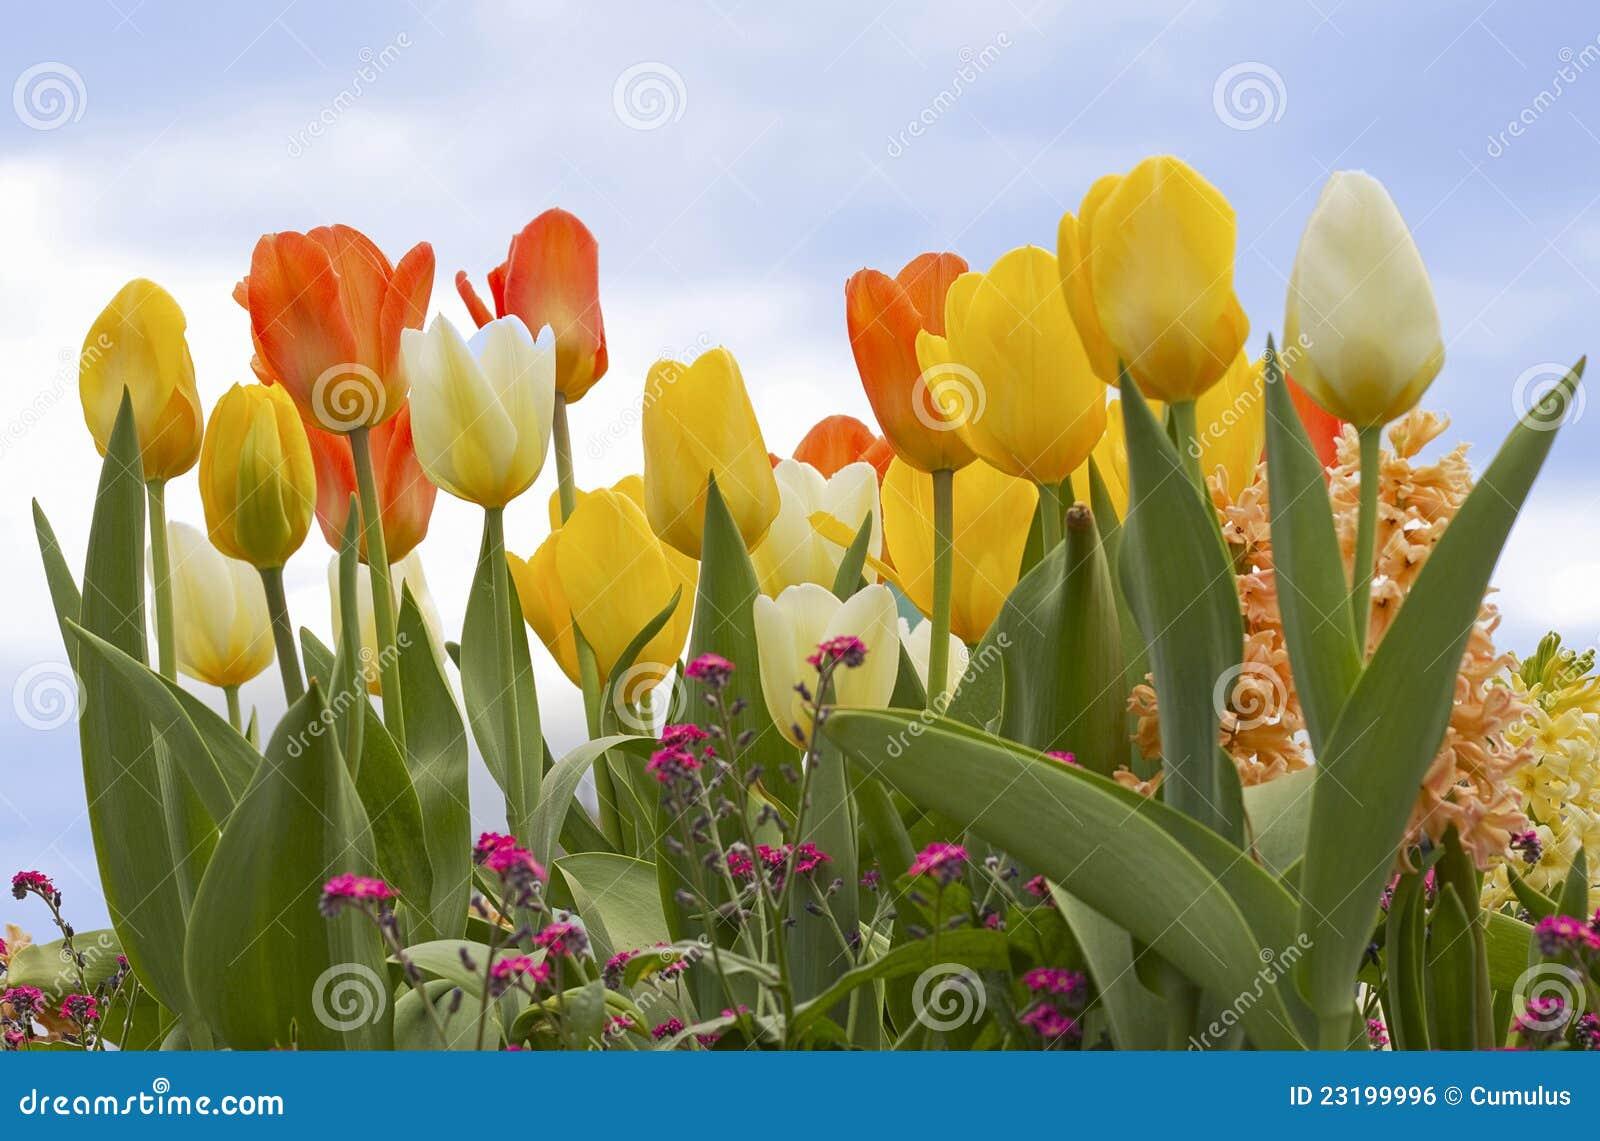 Colourful Spring Flowers Stock Photo Image Of Botany 23199996